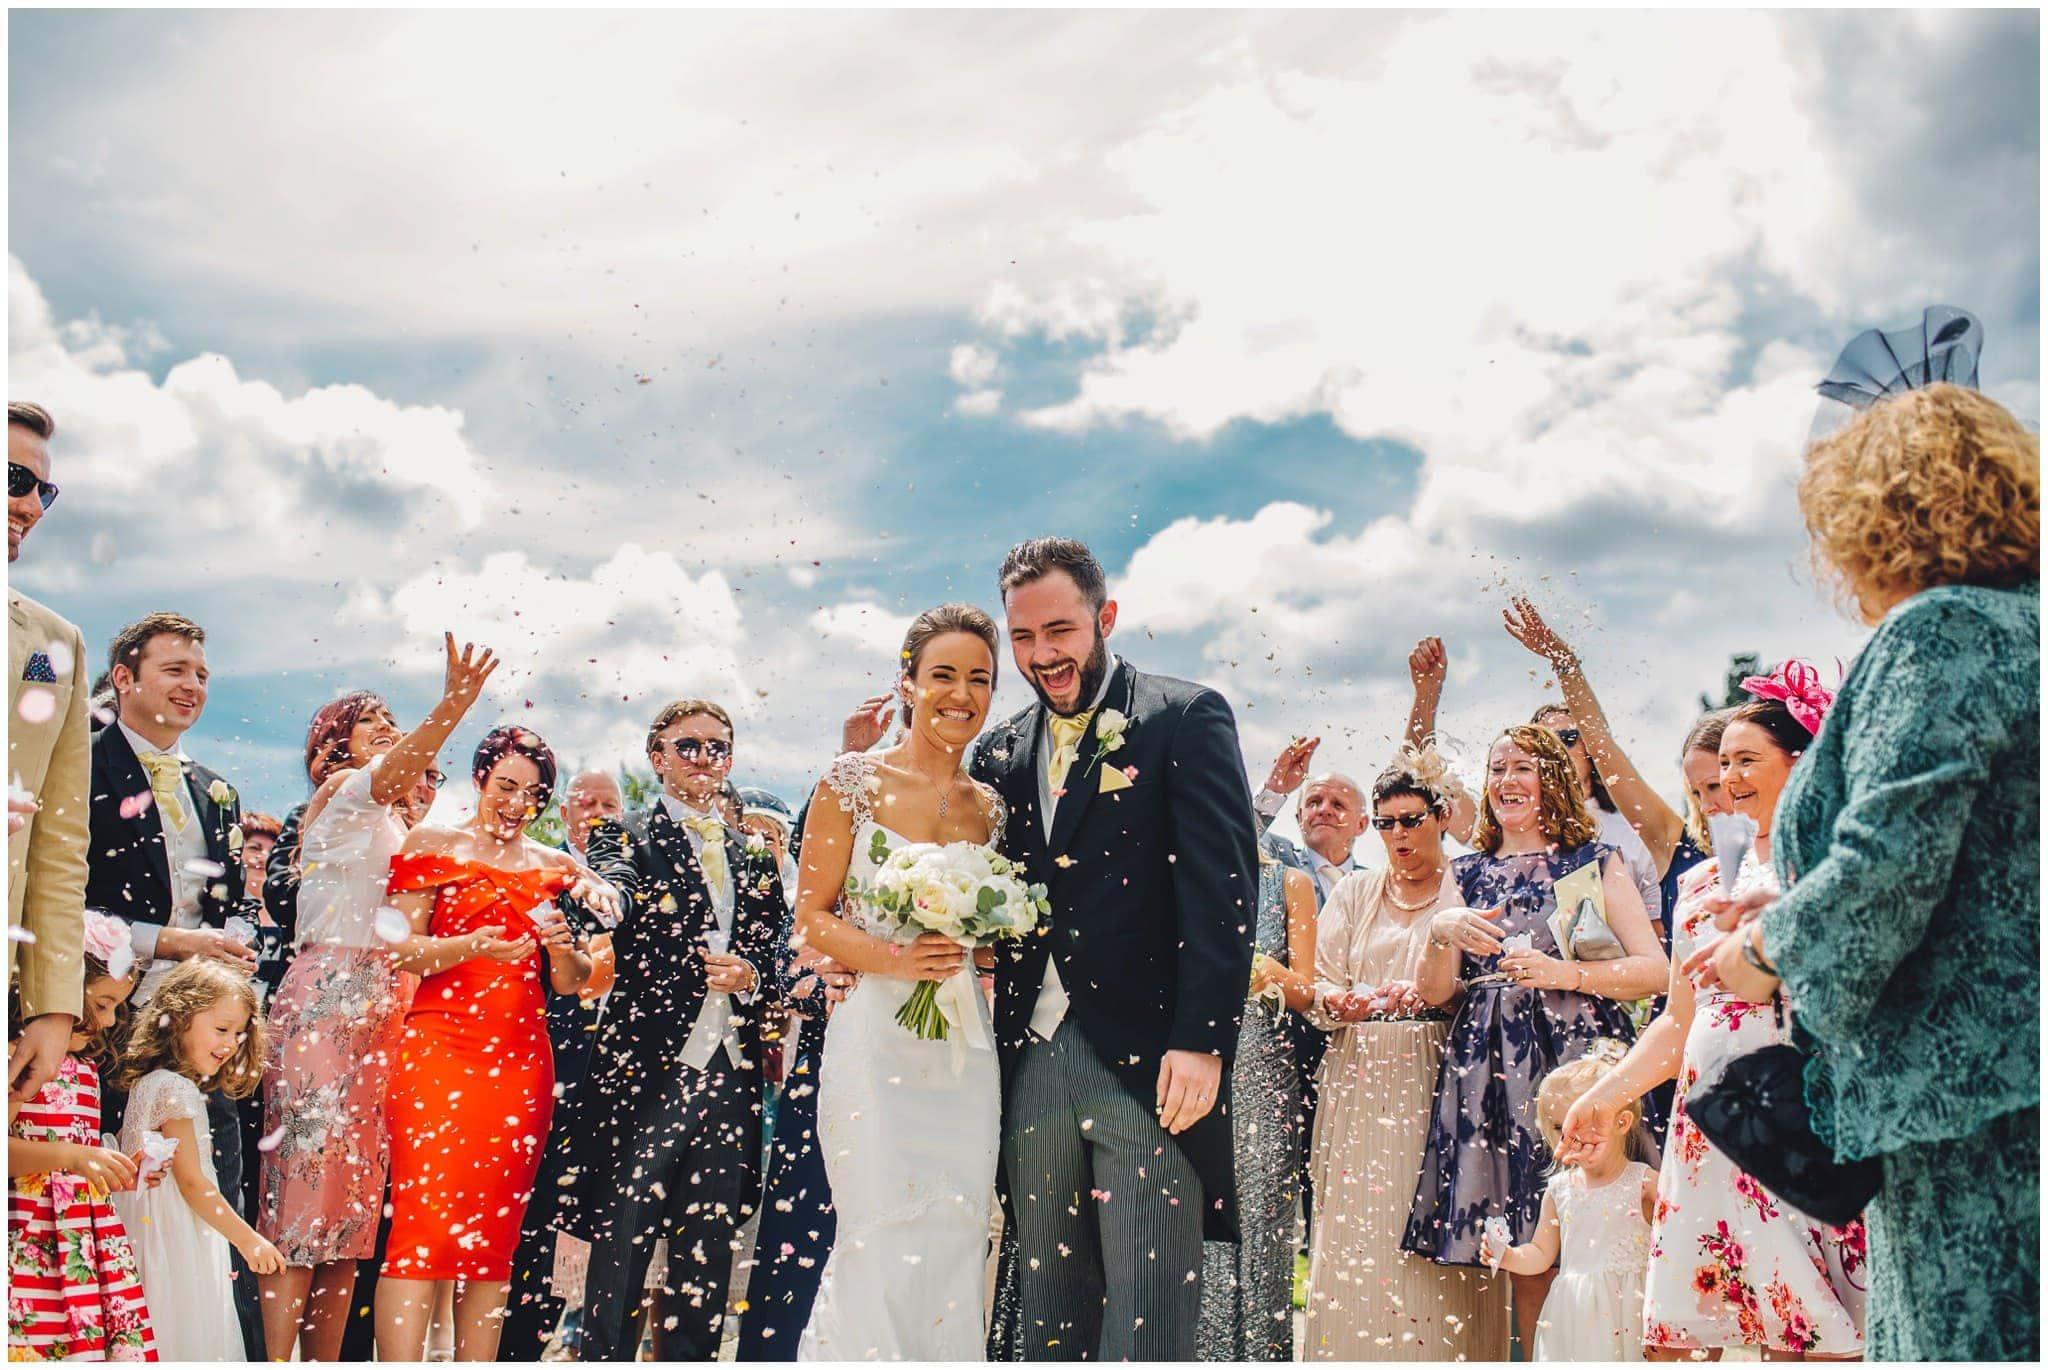 combermere-abbey-wedding-photographer-53